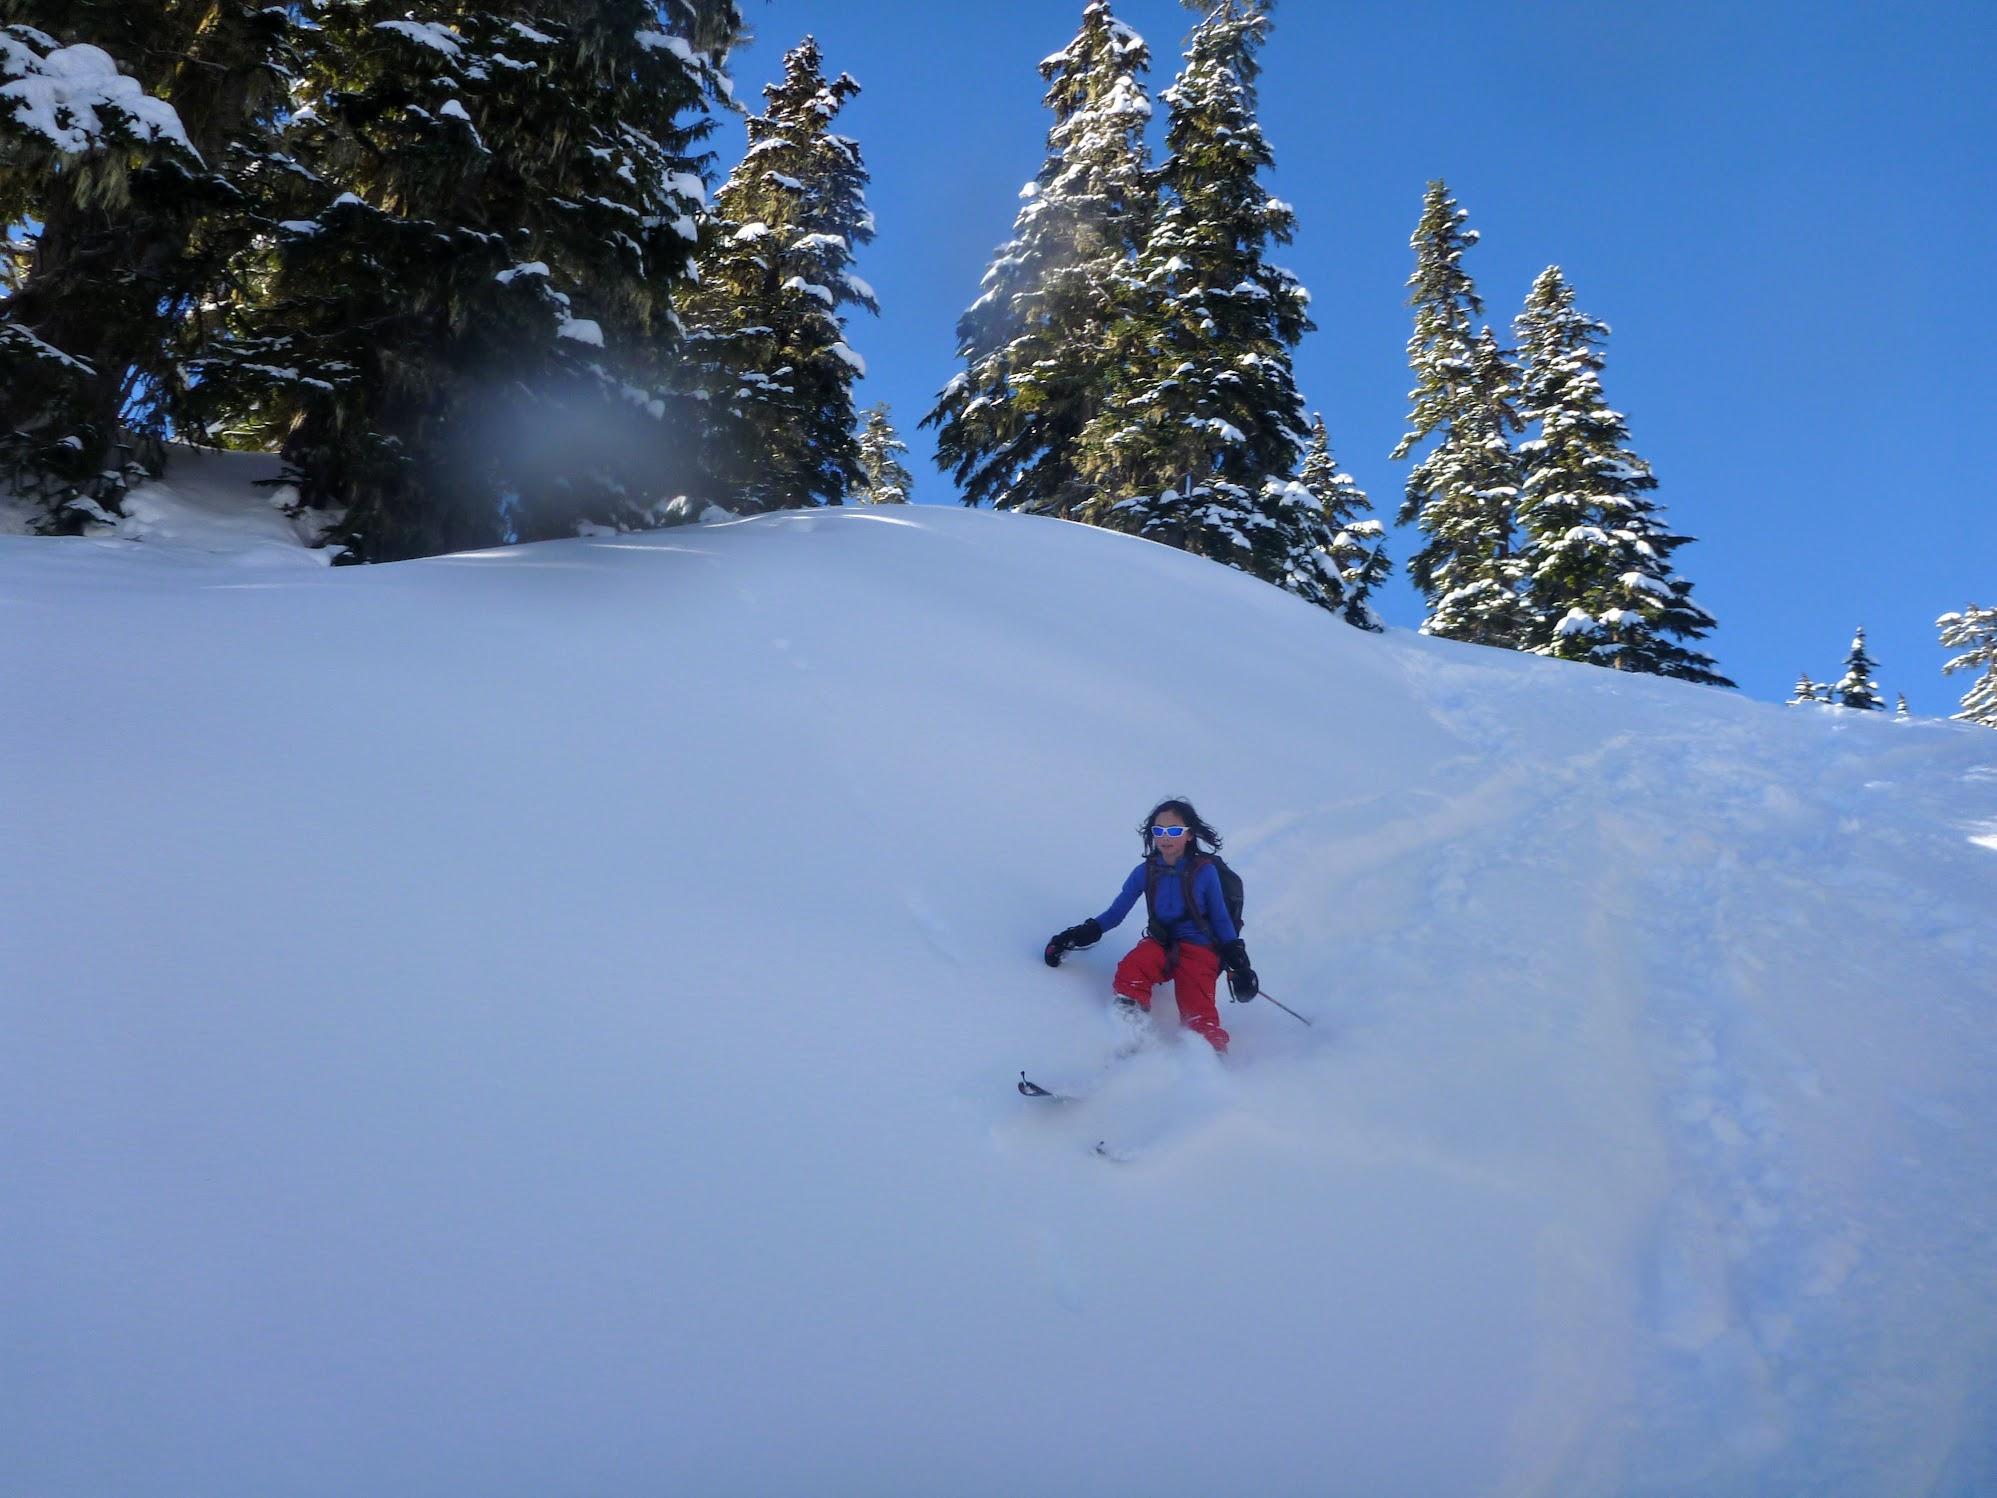 Skiing down a random drainage